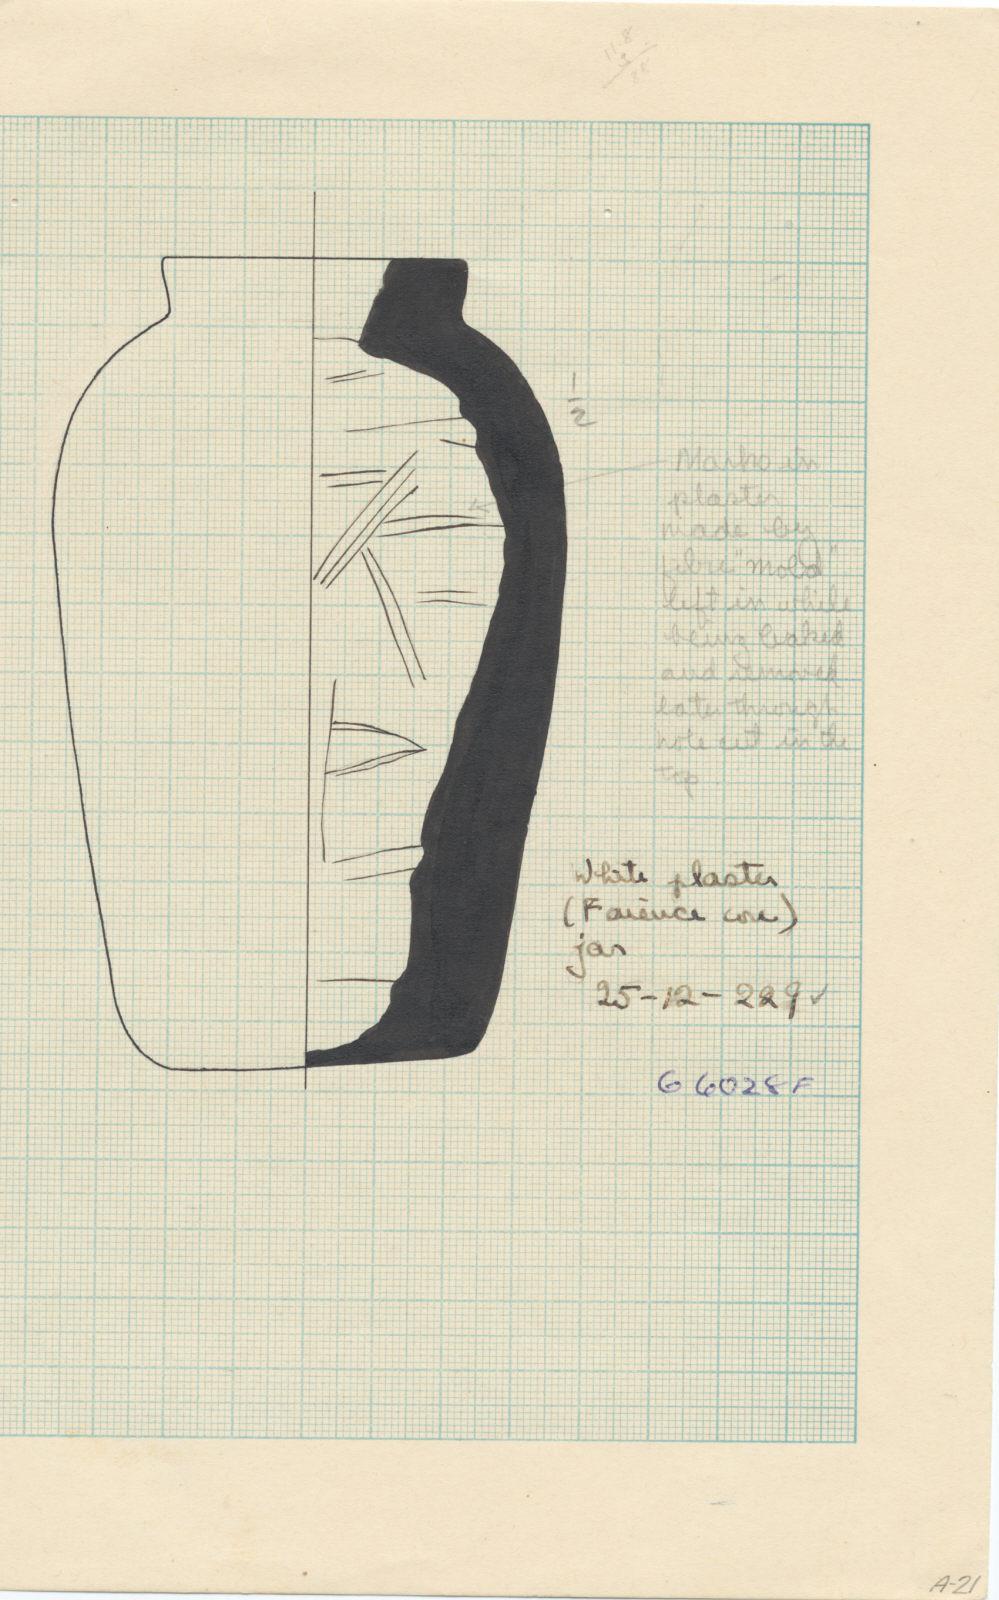 Drawings: G 6028, Shaft F: jar, faience